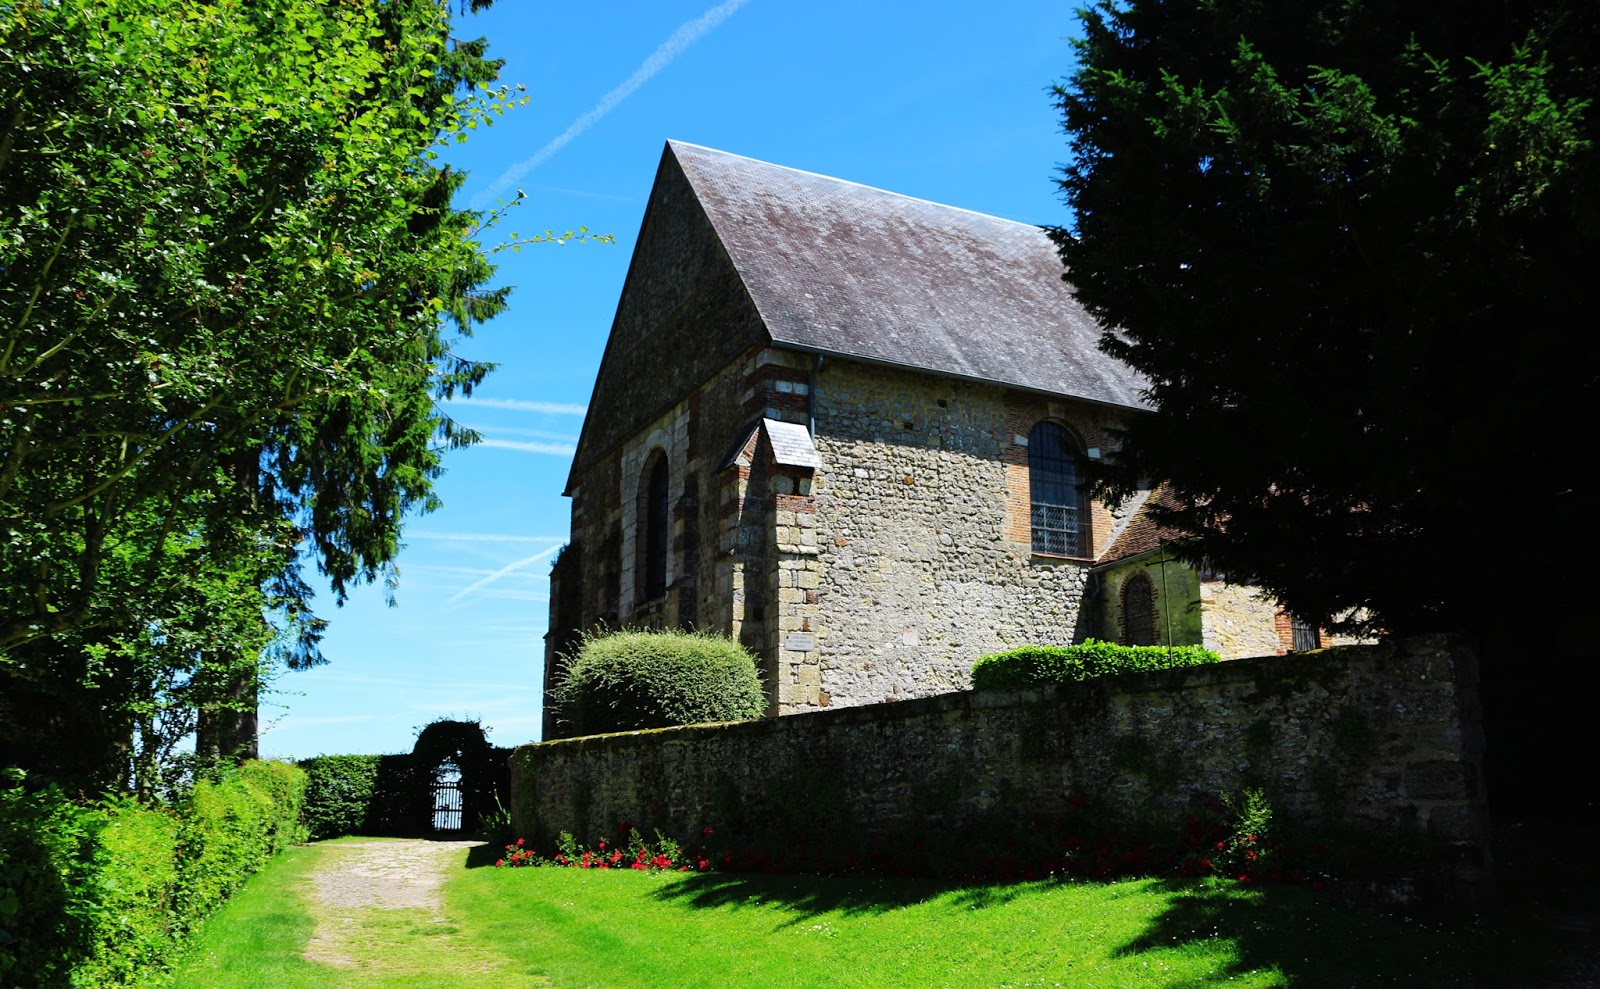 Countryside, Photography, Landscape, France, Style